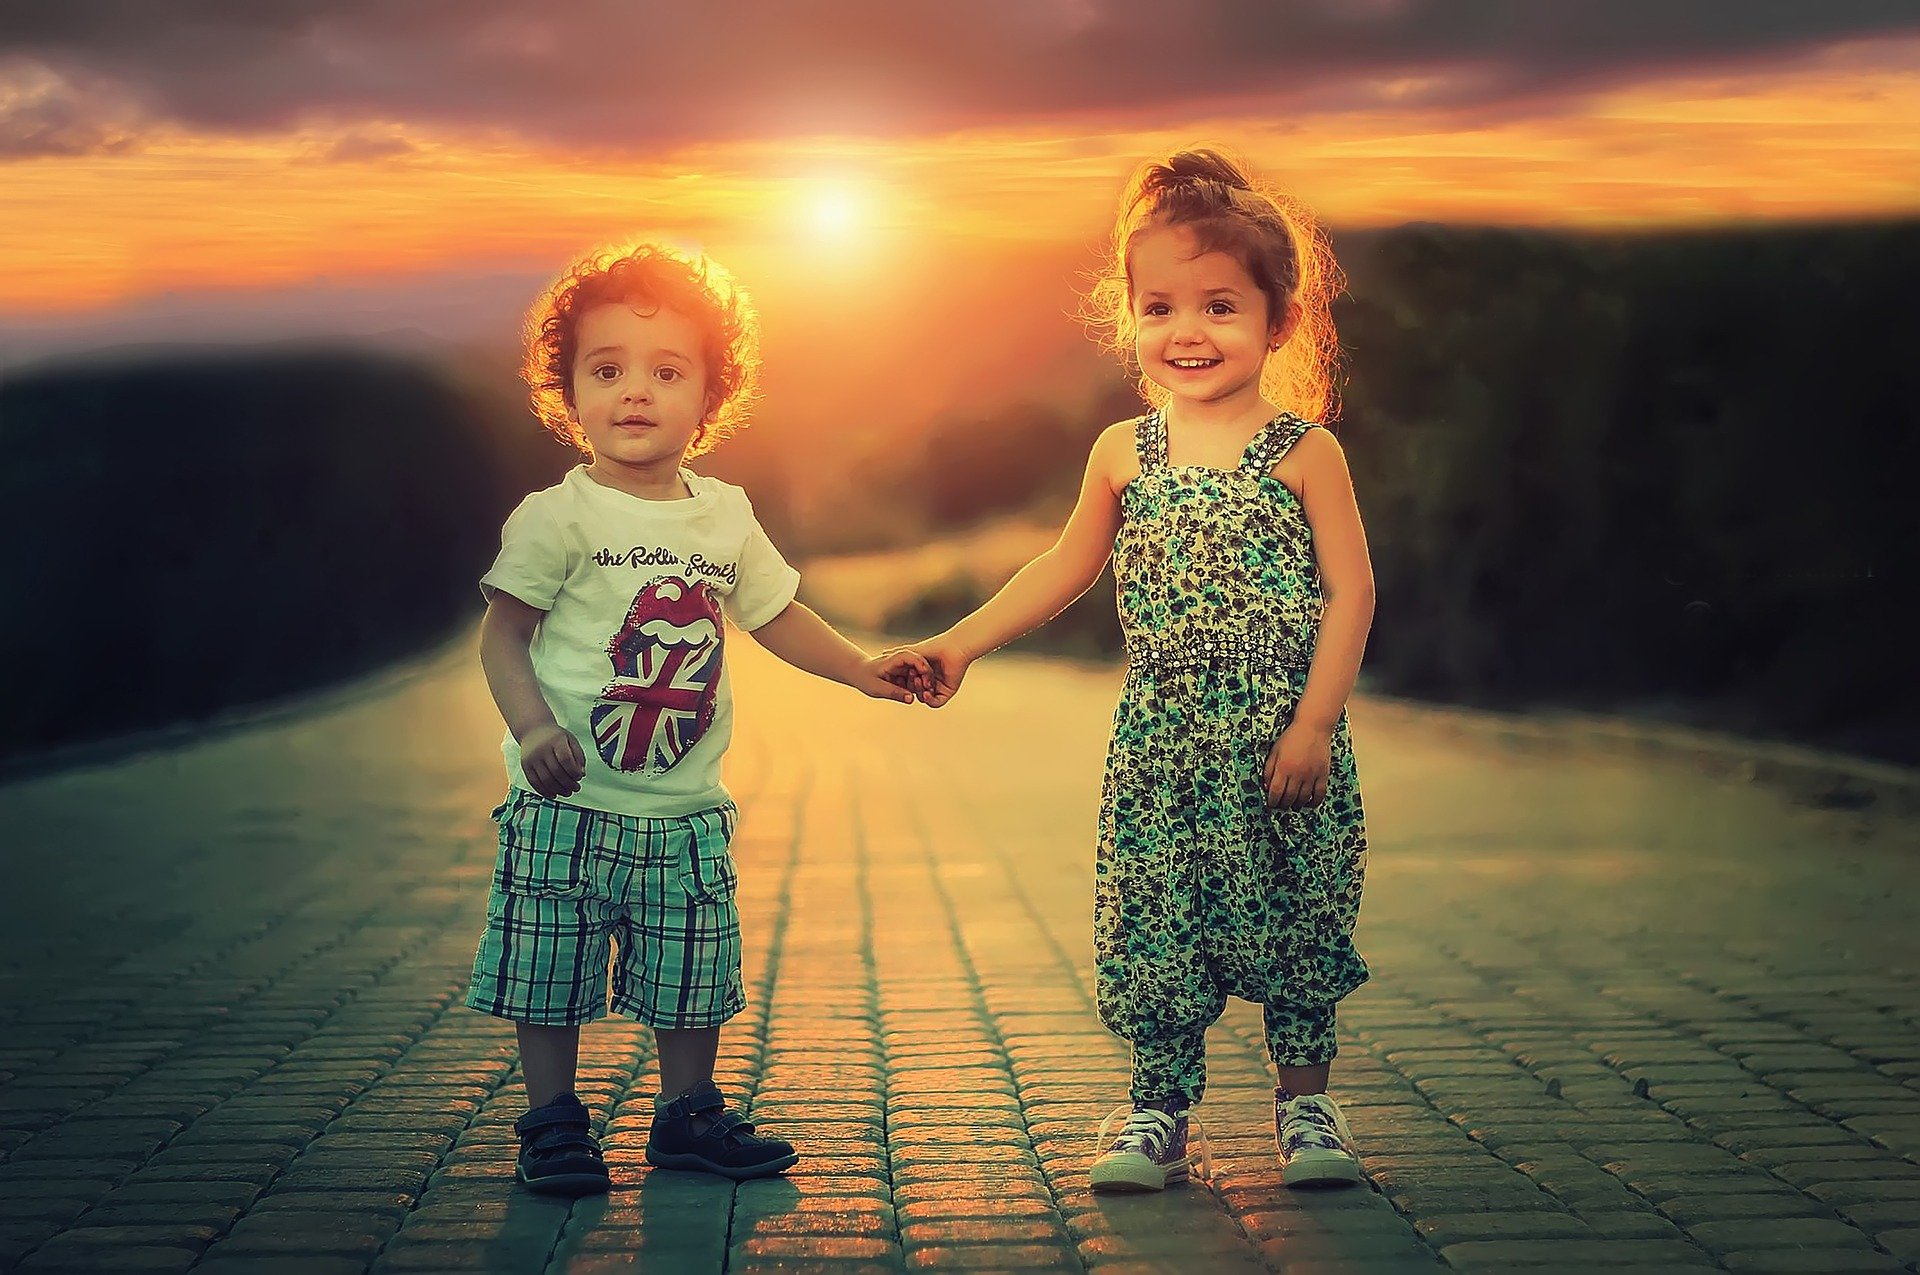 Ci sara mai un Rare Sibling Day in Italia? - Featured image